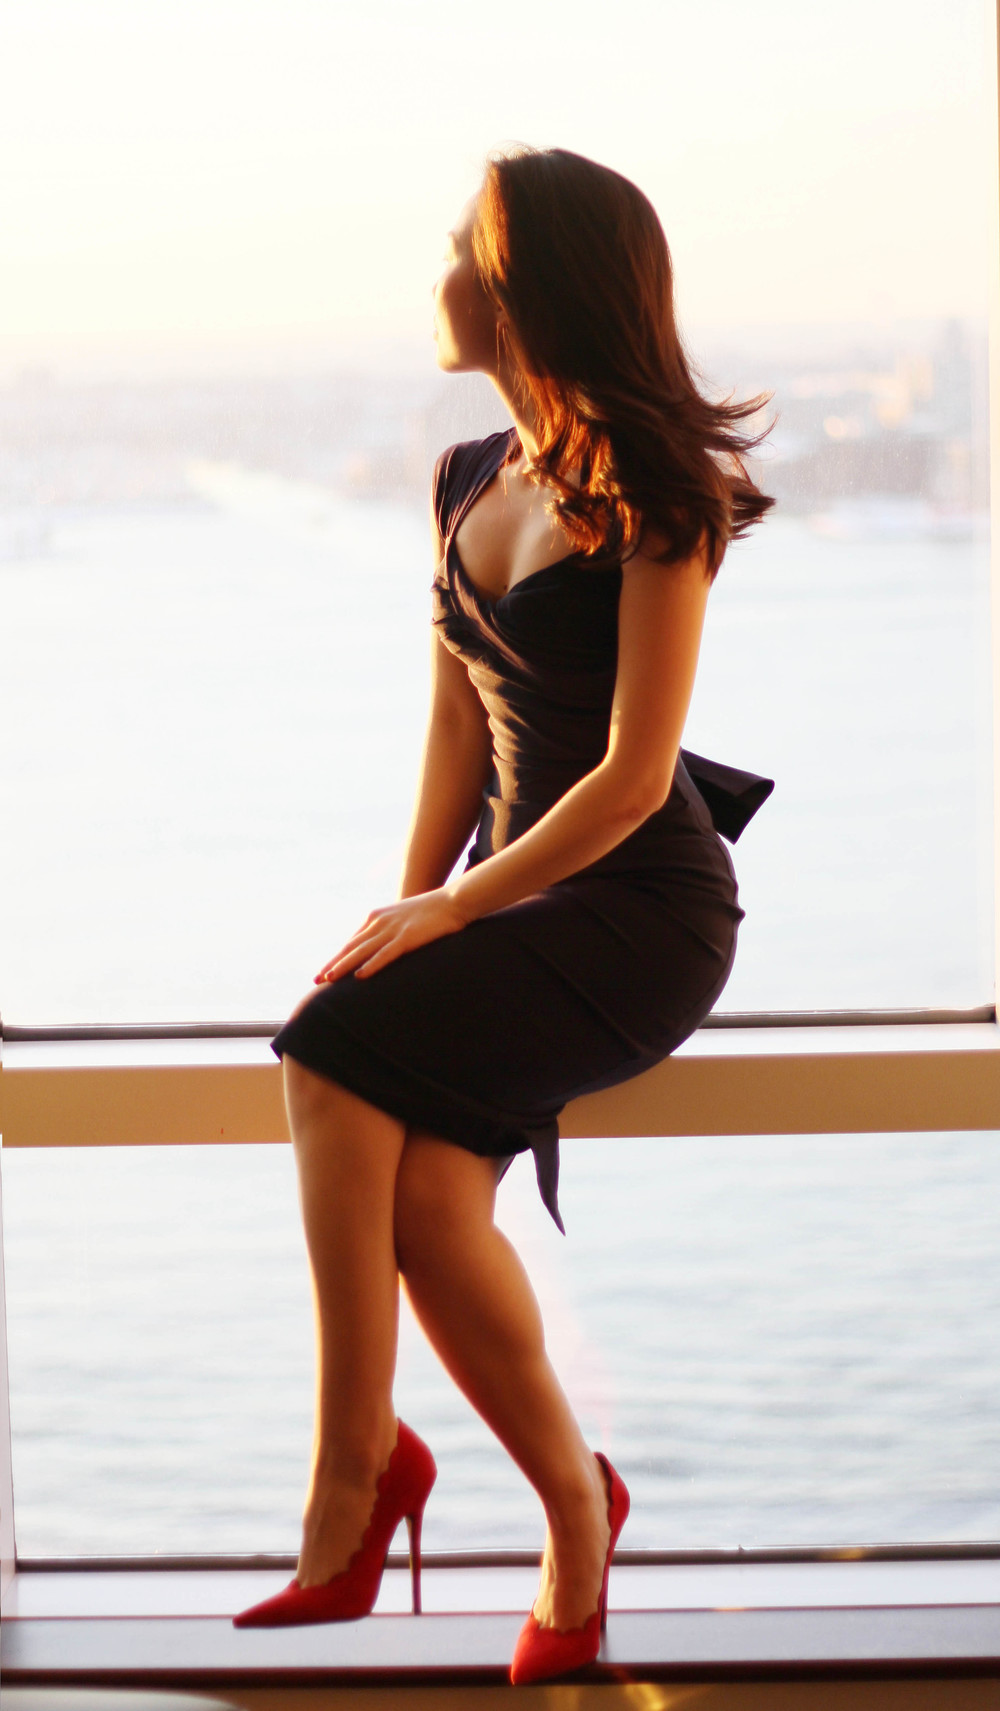 classy lady dress.jpg